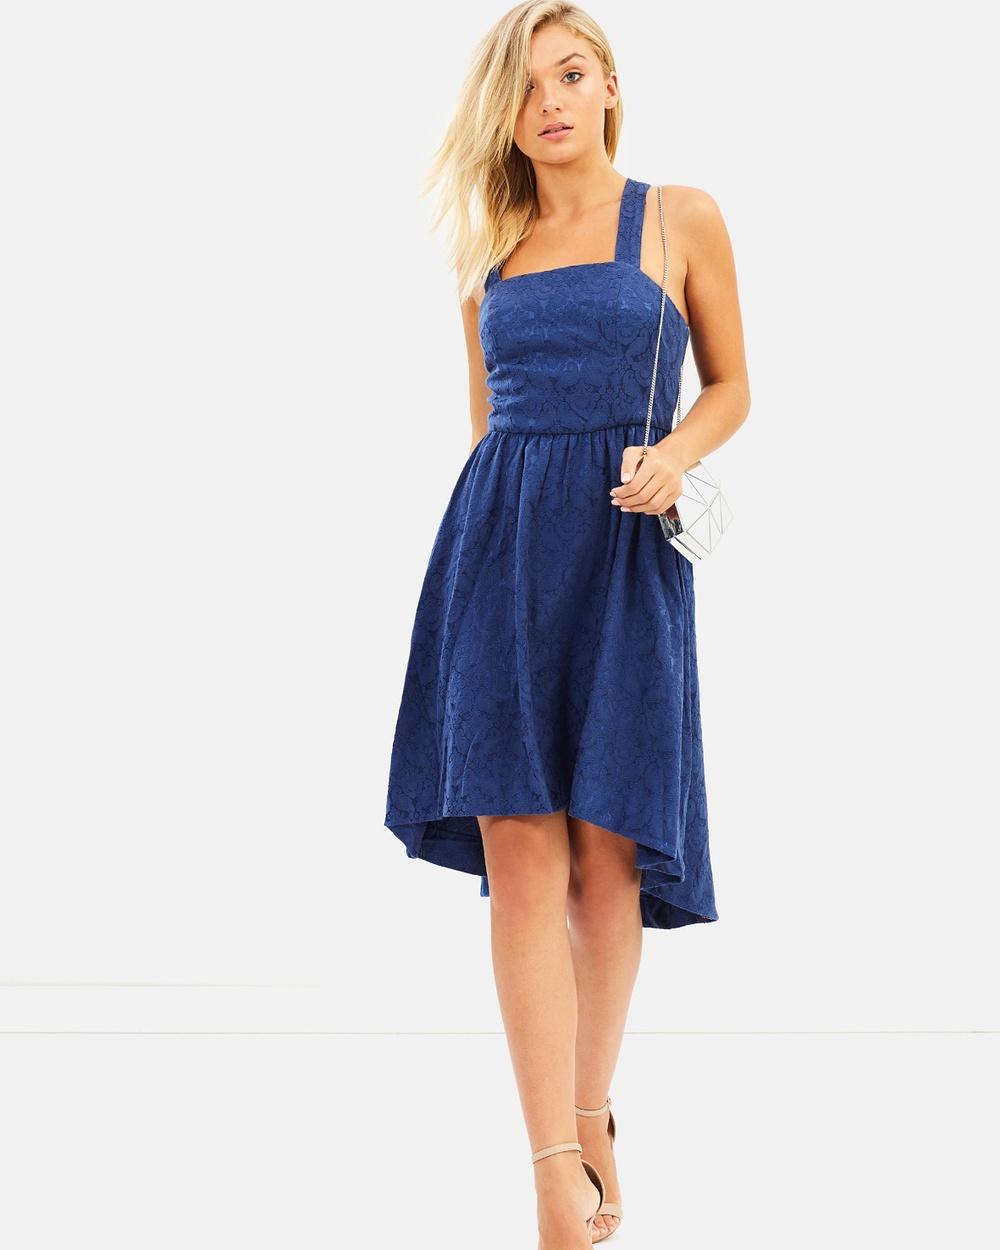 Atmos & Here ICONIC EXCLUSIVE Kenzie Midi Dress Dresses Blue Brocade ICONIC EXCLUSIVE Kenzie Midi Dress